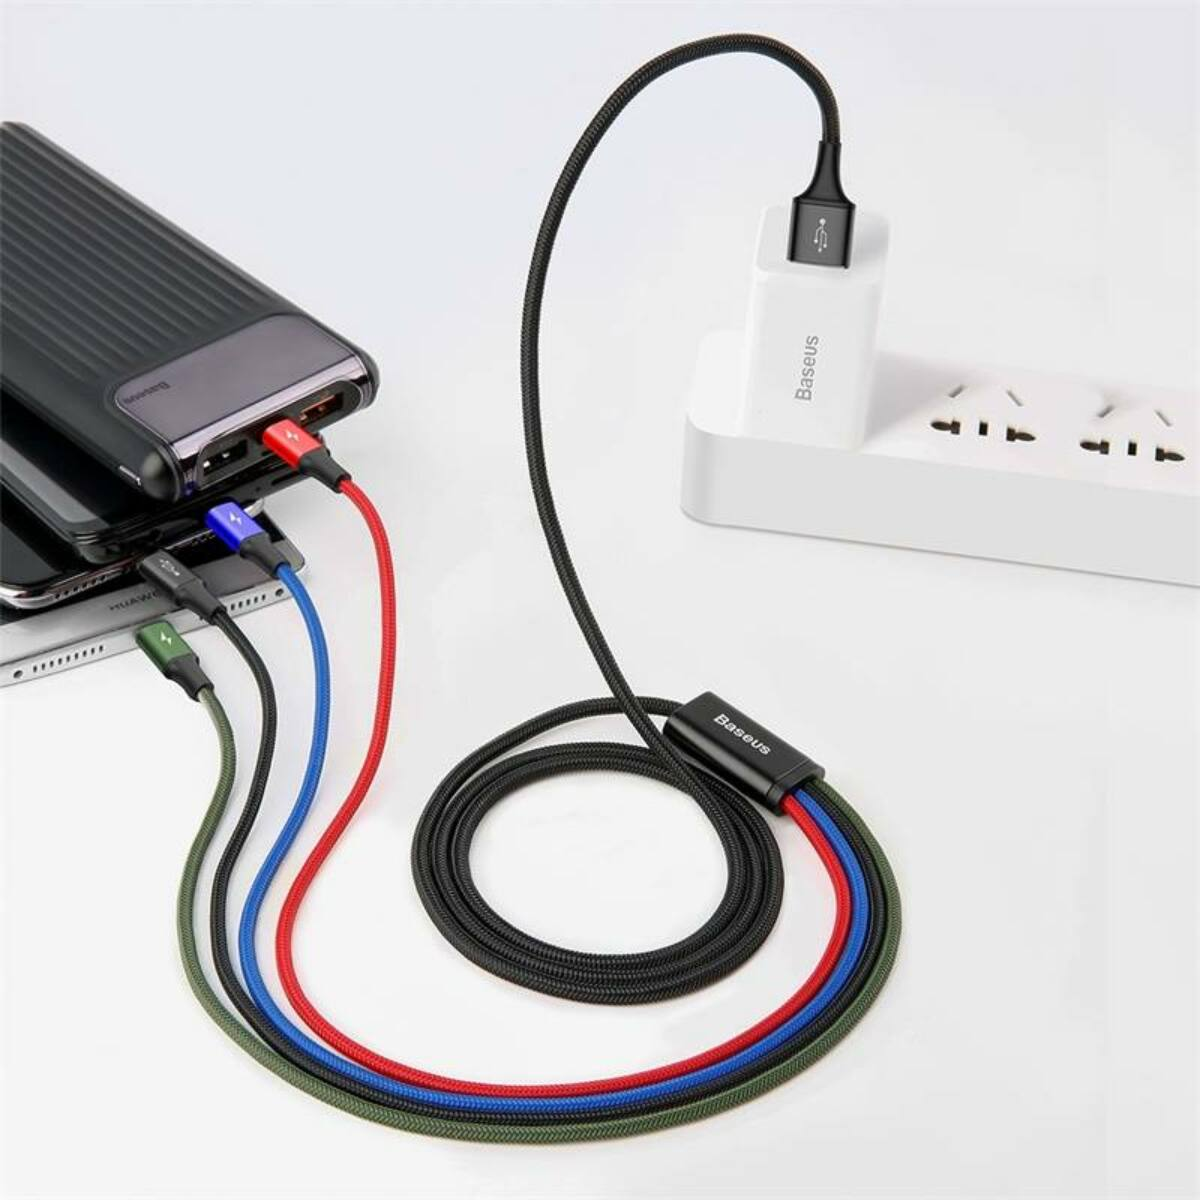 Baseus Univerzális kábel, Fast, 4-in-1 multifunkciós(2 x Fast Lightning + Type-C + micro USB), 3.5A, 1.2m, fekete (CA1T4-A01)